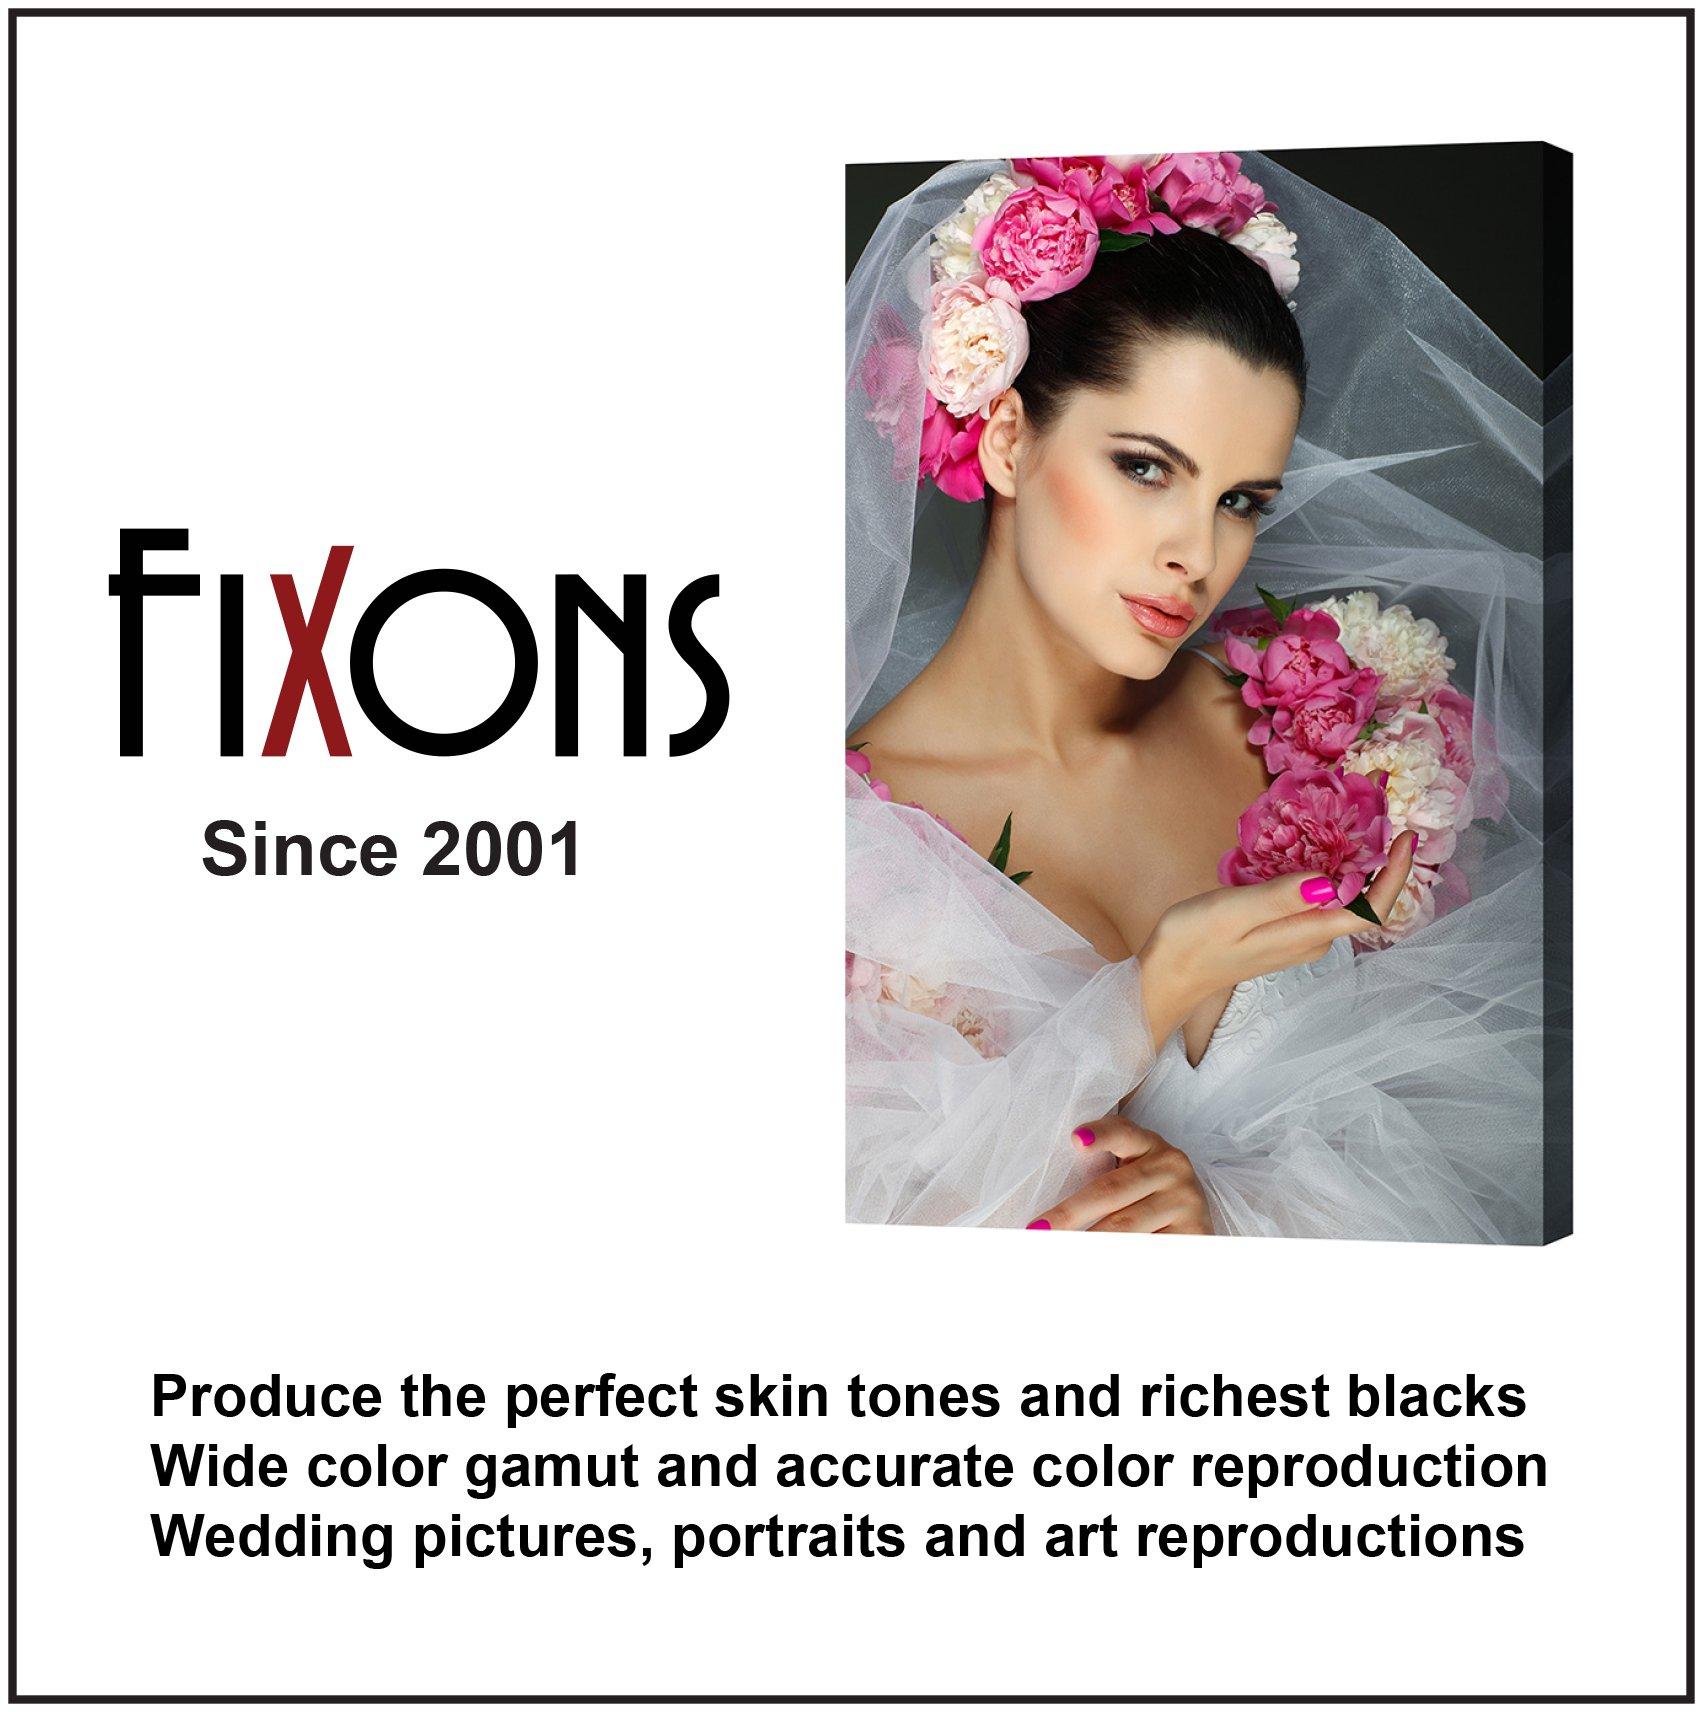 100% Cotton Inkjet Canvas Matte - 24 x 40 (1 Roll)